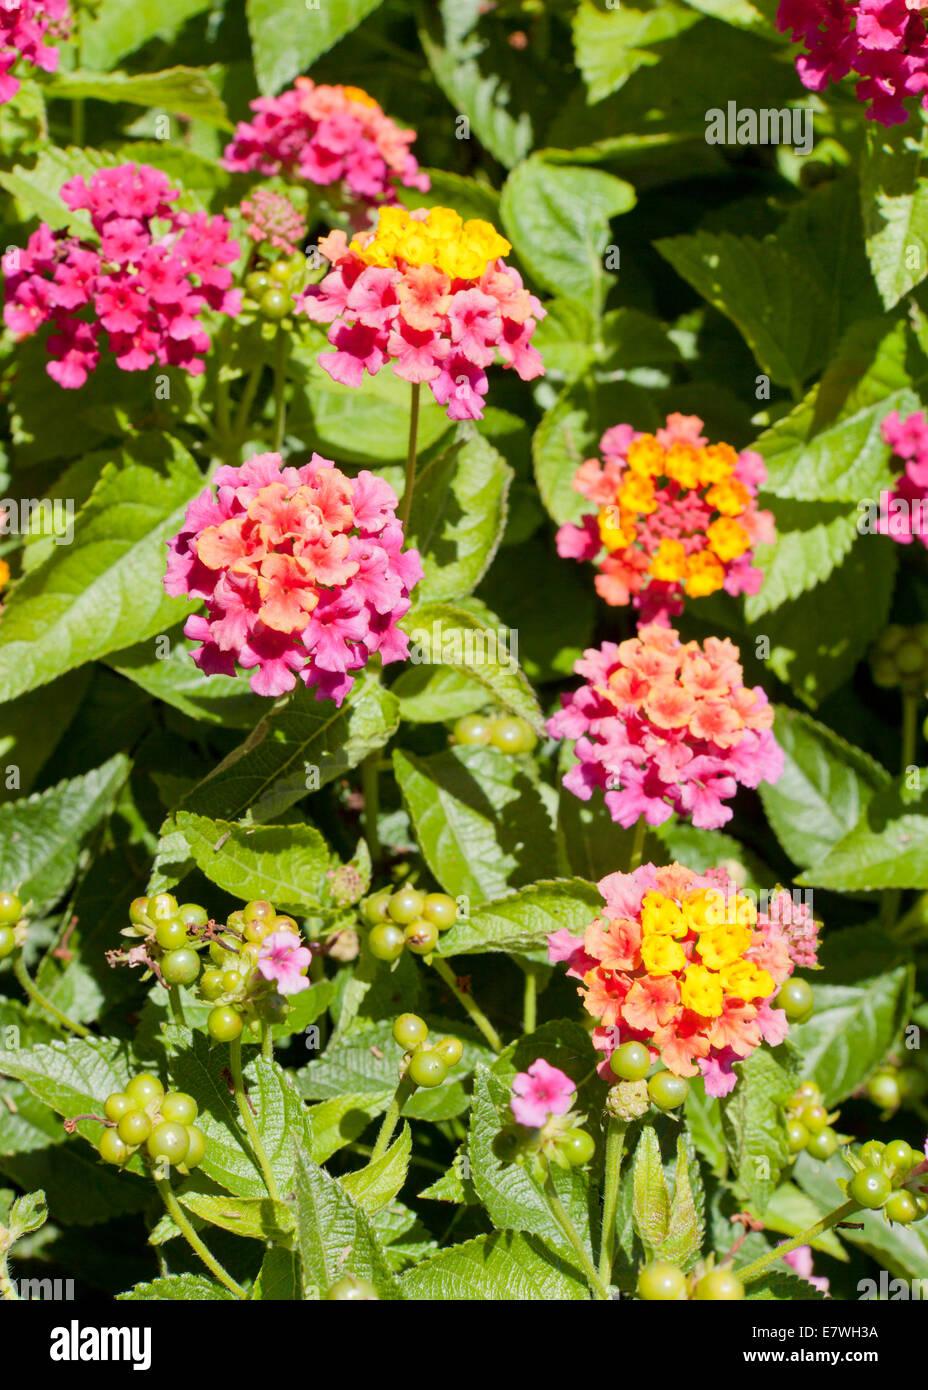 Lantana flowers (Lantana camara) Stock Photo